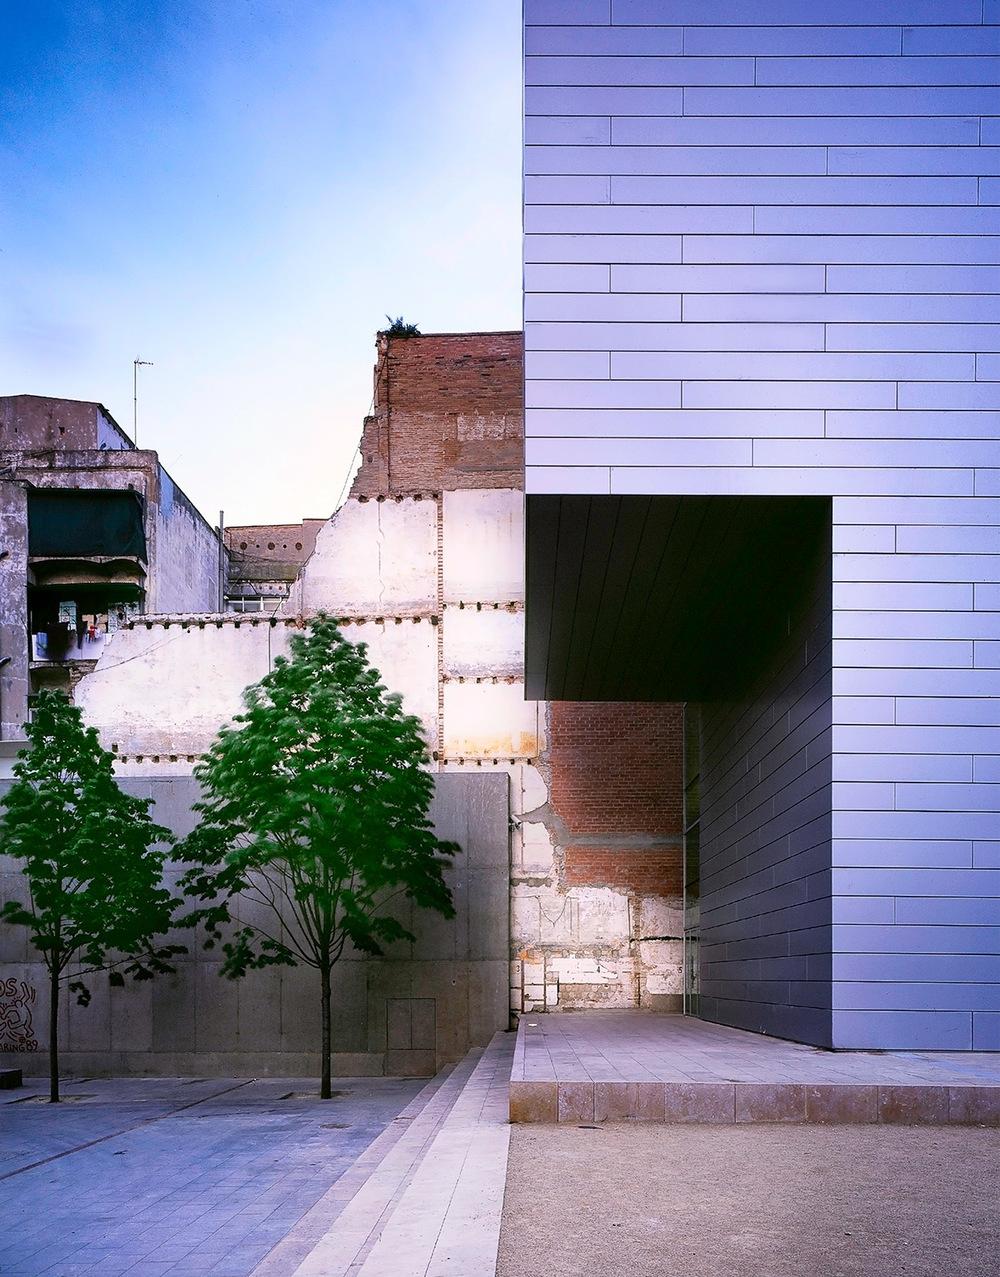 Ramon Llull University Campus  | Dani Freixes | Barcelona